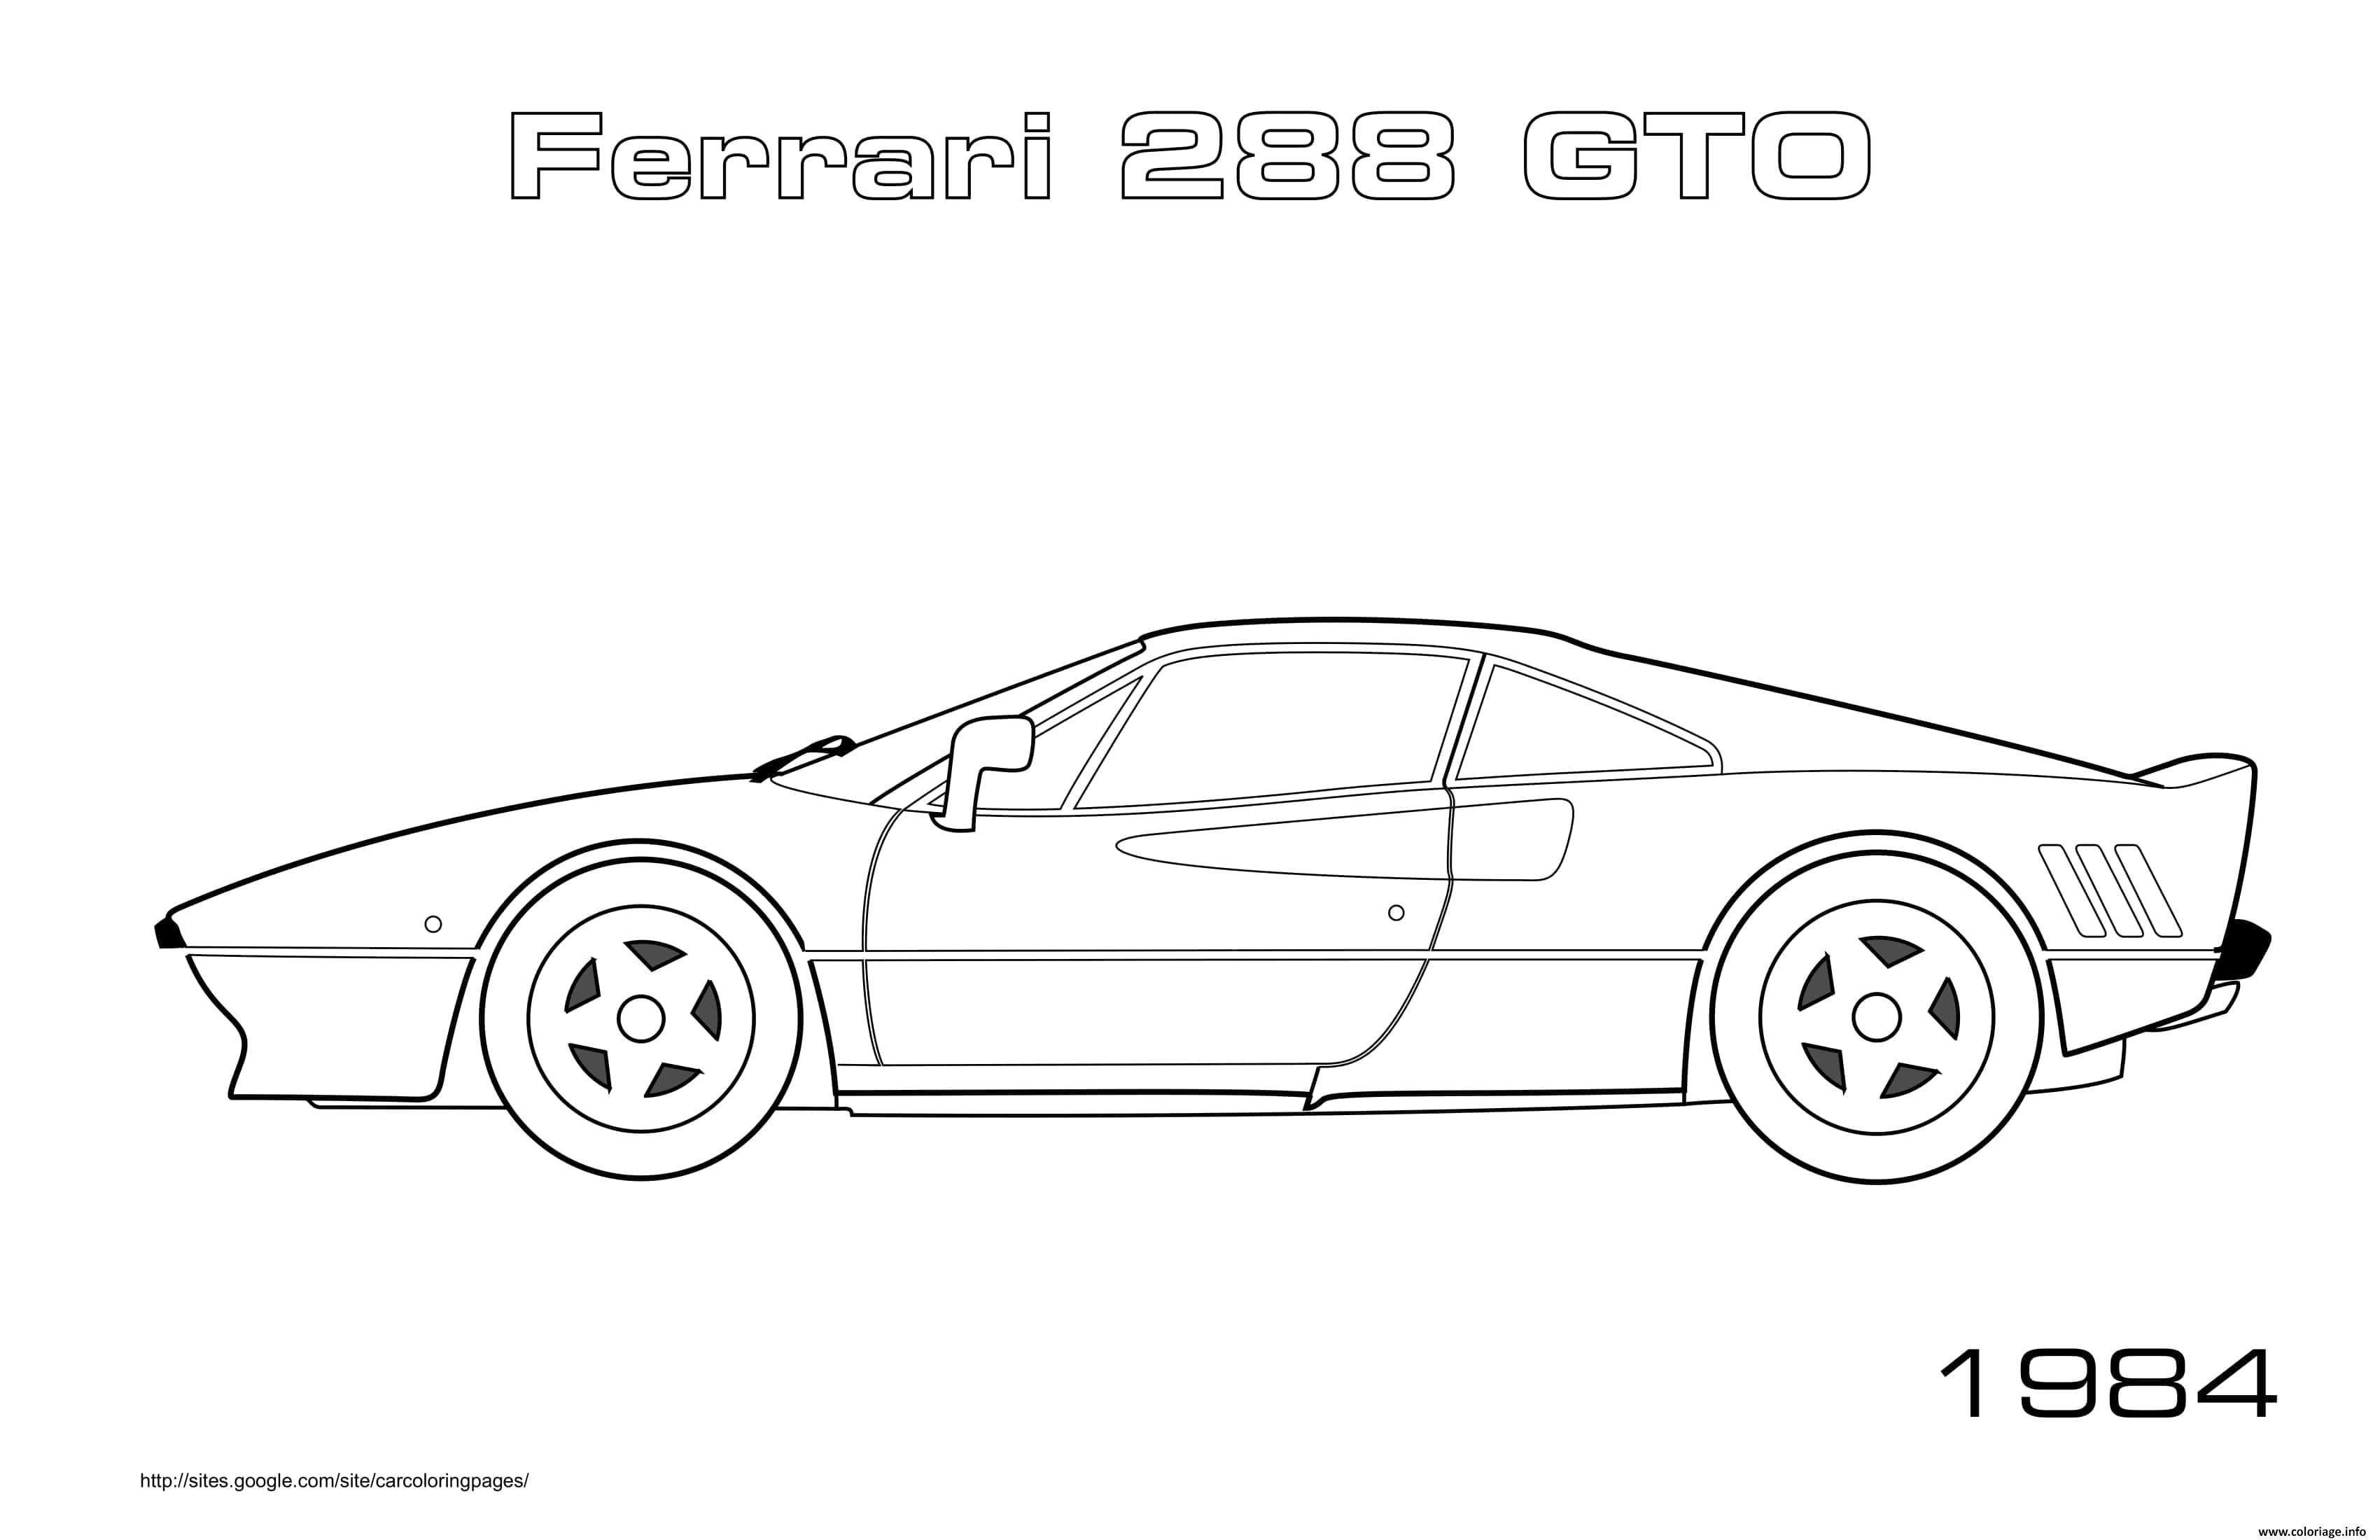 Dessin Ferrari 288 Gto 1984 Coloriage Gratuit à Imprimer